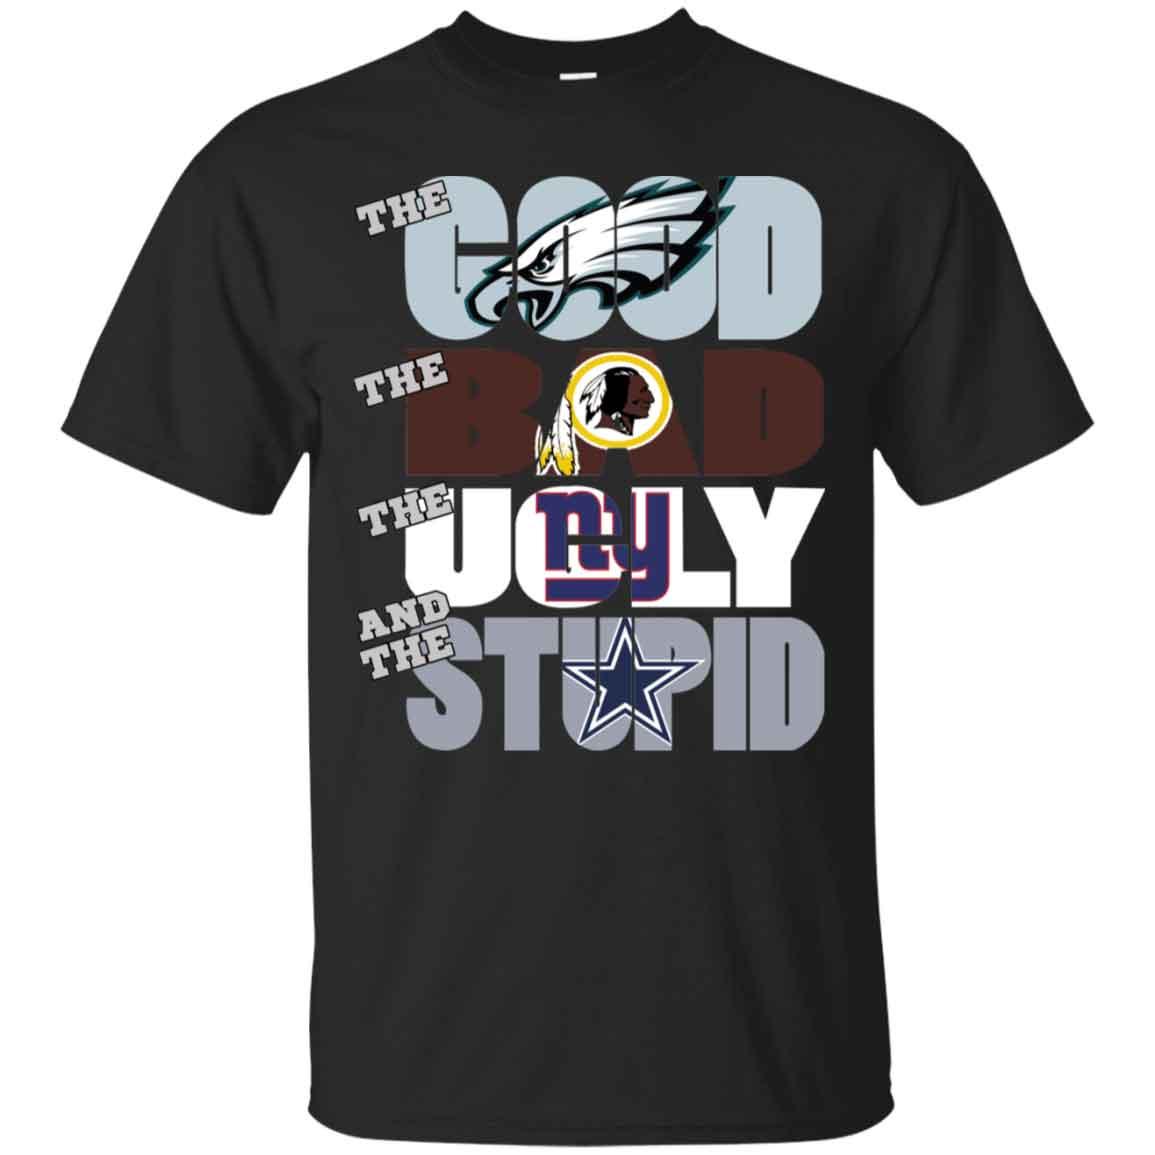 Philadelphia Eagles The Good The Bad The Ugly The Stupid Christmas Ugly Sweater Hoodies Sweatshirts